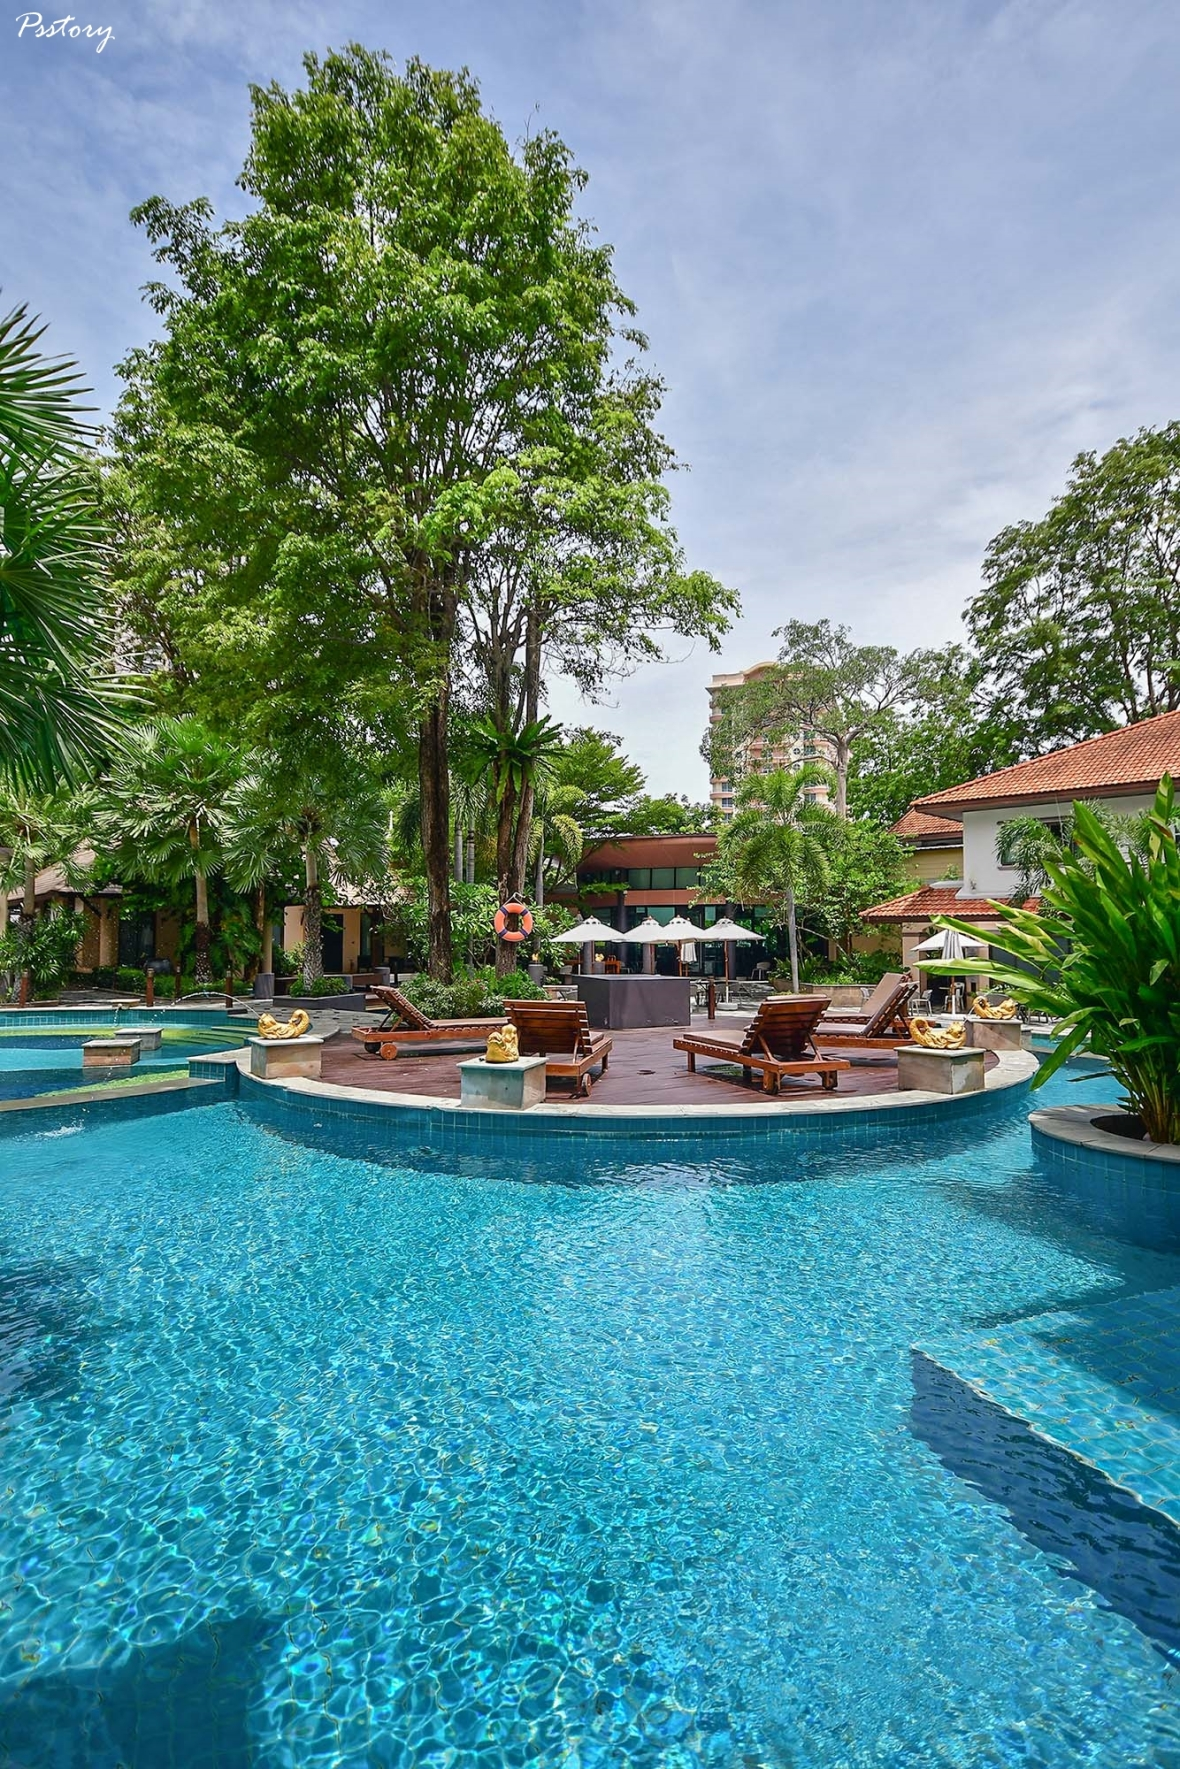 Long Beach Pattaya (86)